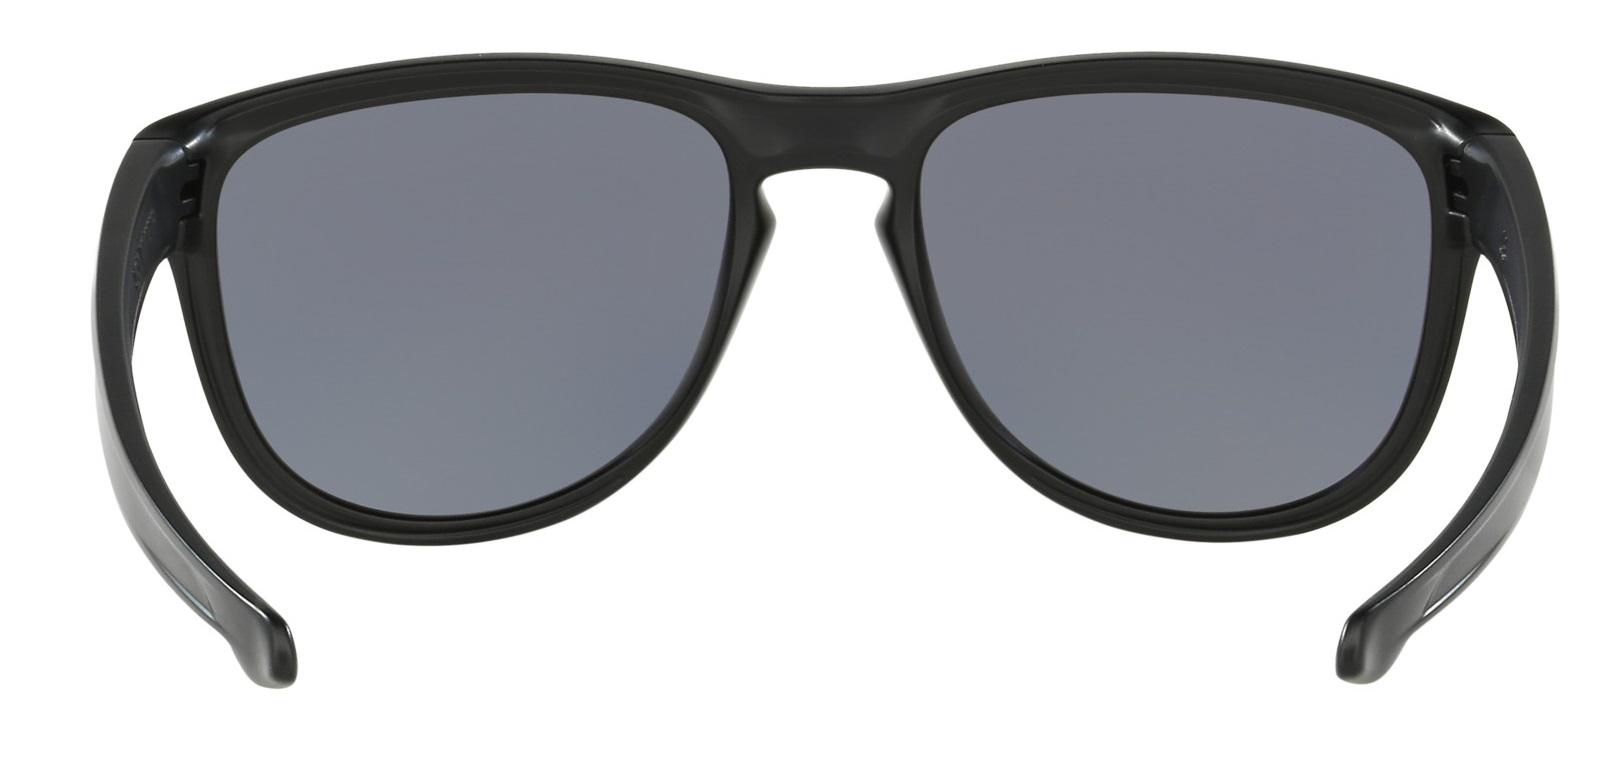 0c5e8fe6902 Oakley SLIVER ROUND Sunglasses matte black grey